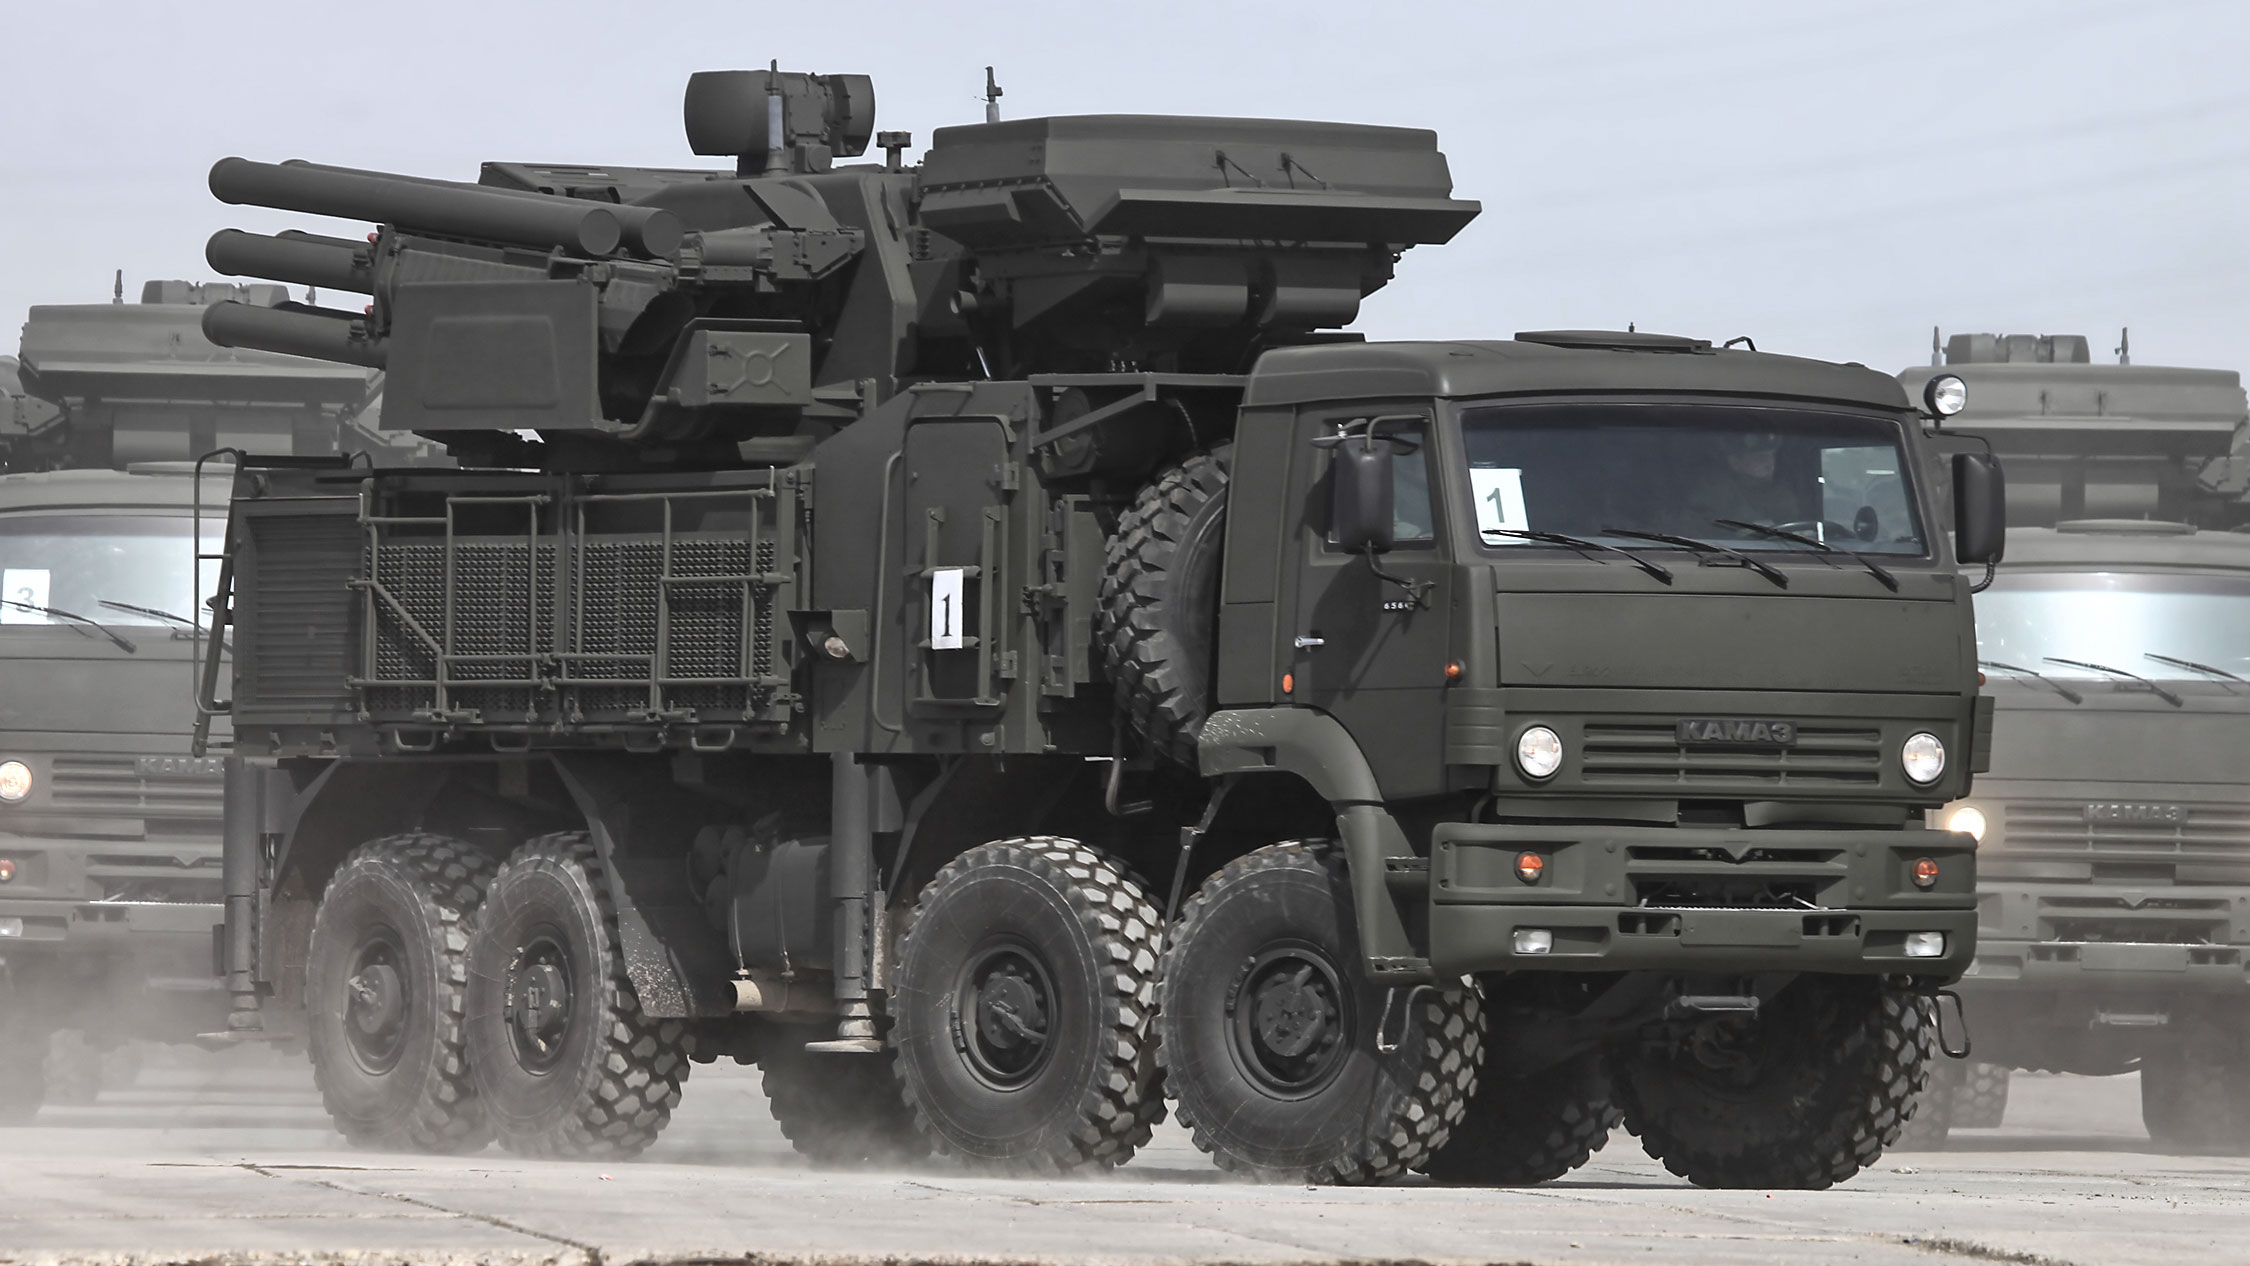 "<p>Фото © <a href=""https://www.vitalykuzmin.net/Military/12-April-Parade-2013-rehearsal/"" target=""_blank"" rel=""noopener noreferrer"">Vitaly V. Kuzmin</a></p>"